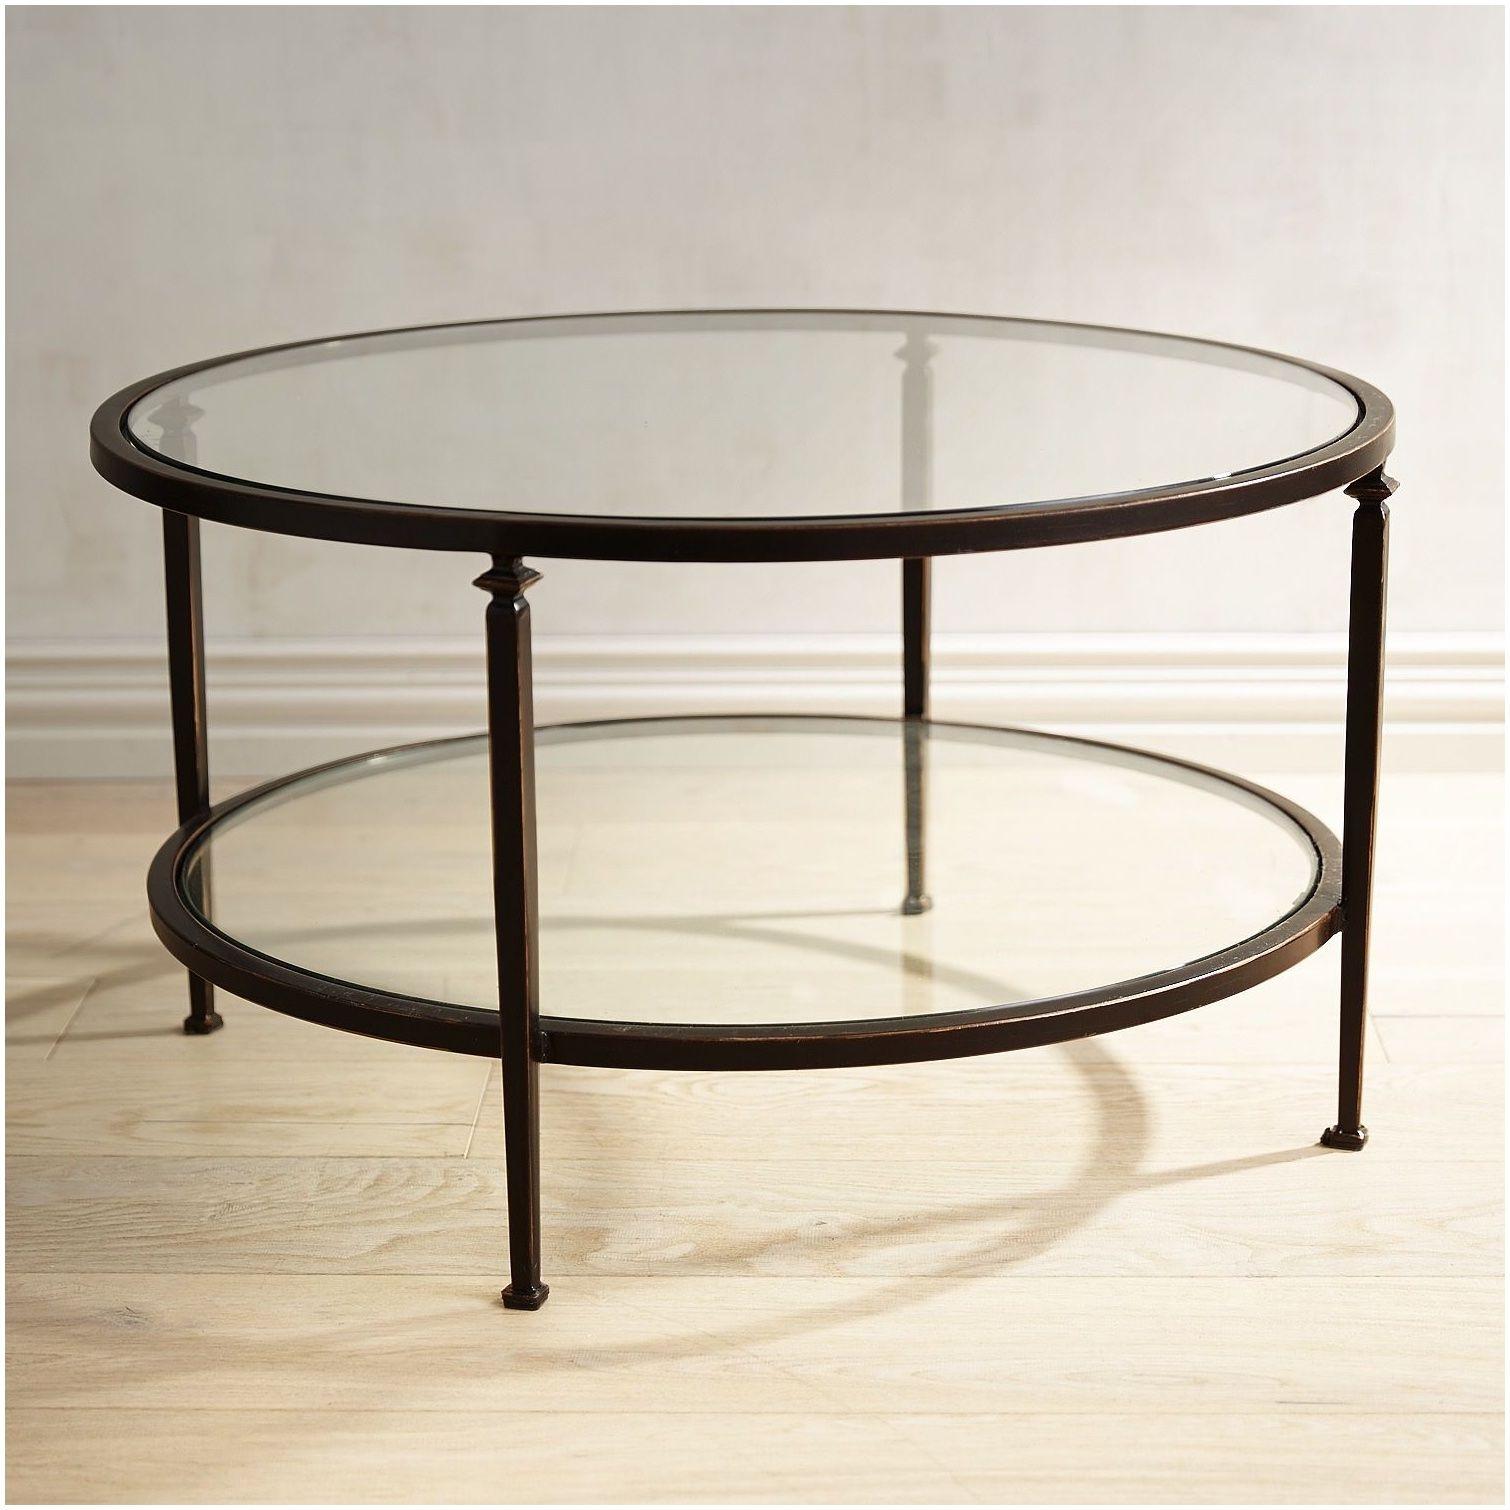 2 Round Tea Table Coffee Table Desk Sets Black White Twin Sets Multi Function Wood Steel Living Roo Coffee Table Coffee Table Setting Coffee Table Desk [ 1500 x 1500 Pixel ]